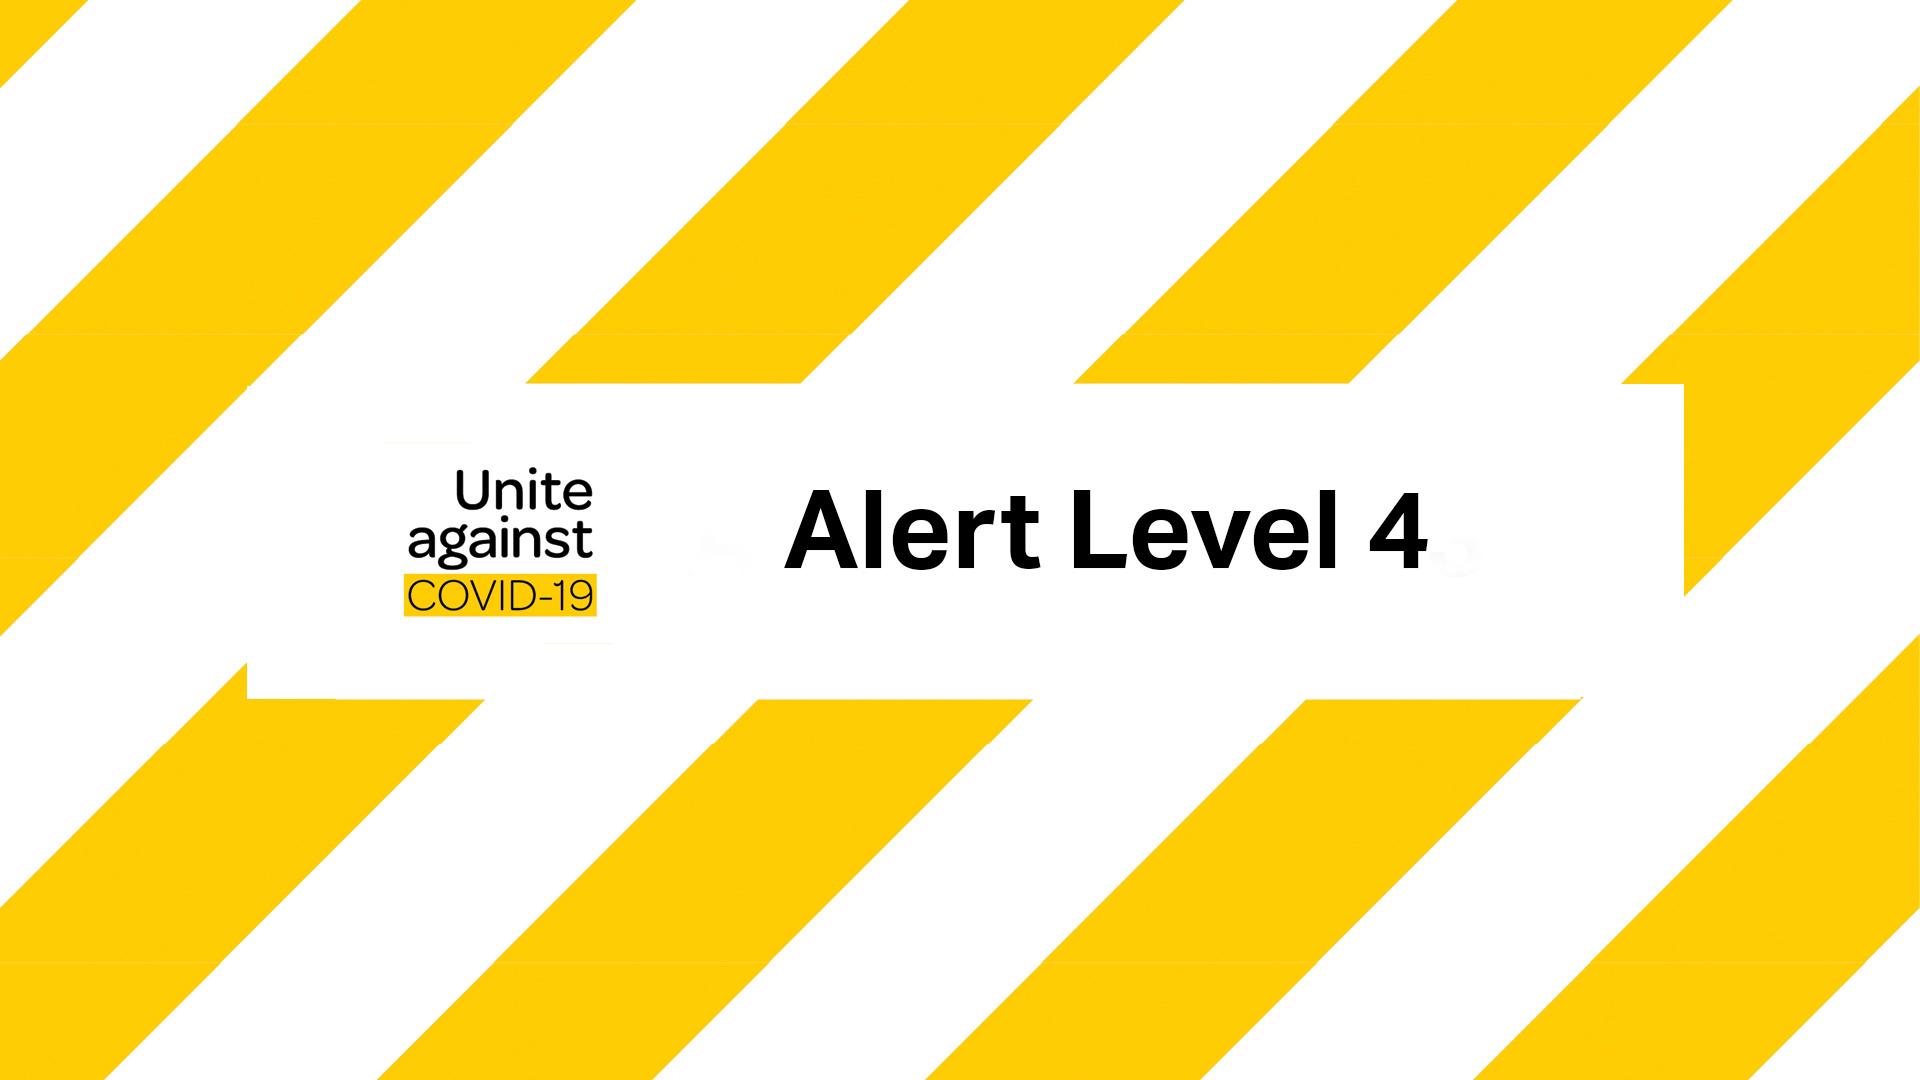 Important COVID-19 Alert Level 4 Service Update